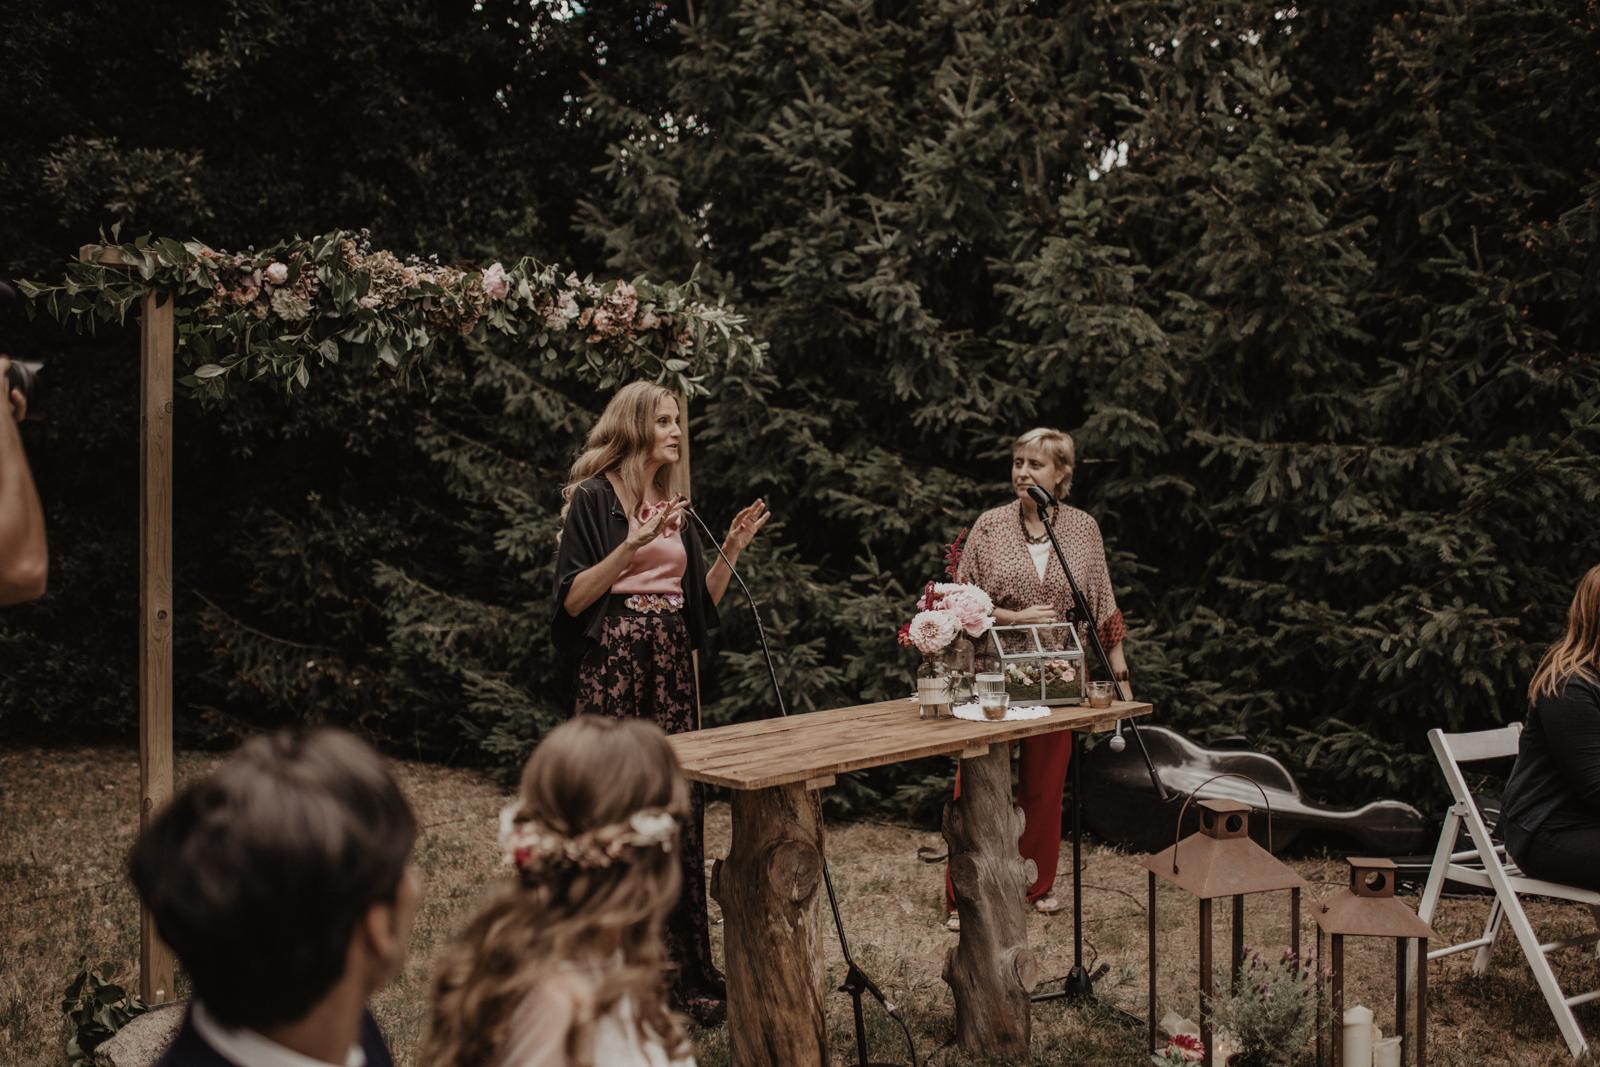 thenortherngirlphotography_photography_thenortherngirl_rebeccascabros_wedding_weddingphotography_weddingphotographer_barcelona_bodaenbarcelona_bodaenmaselmarti_bodarogeryvane-370.jpg